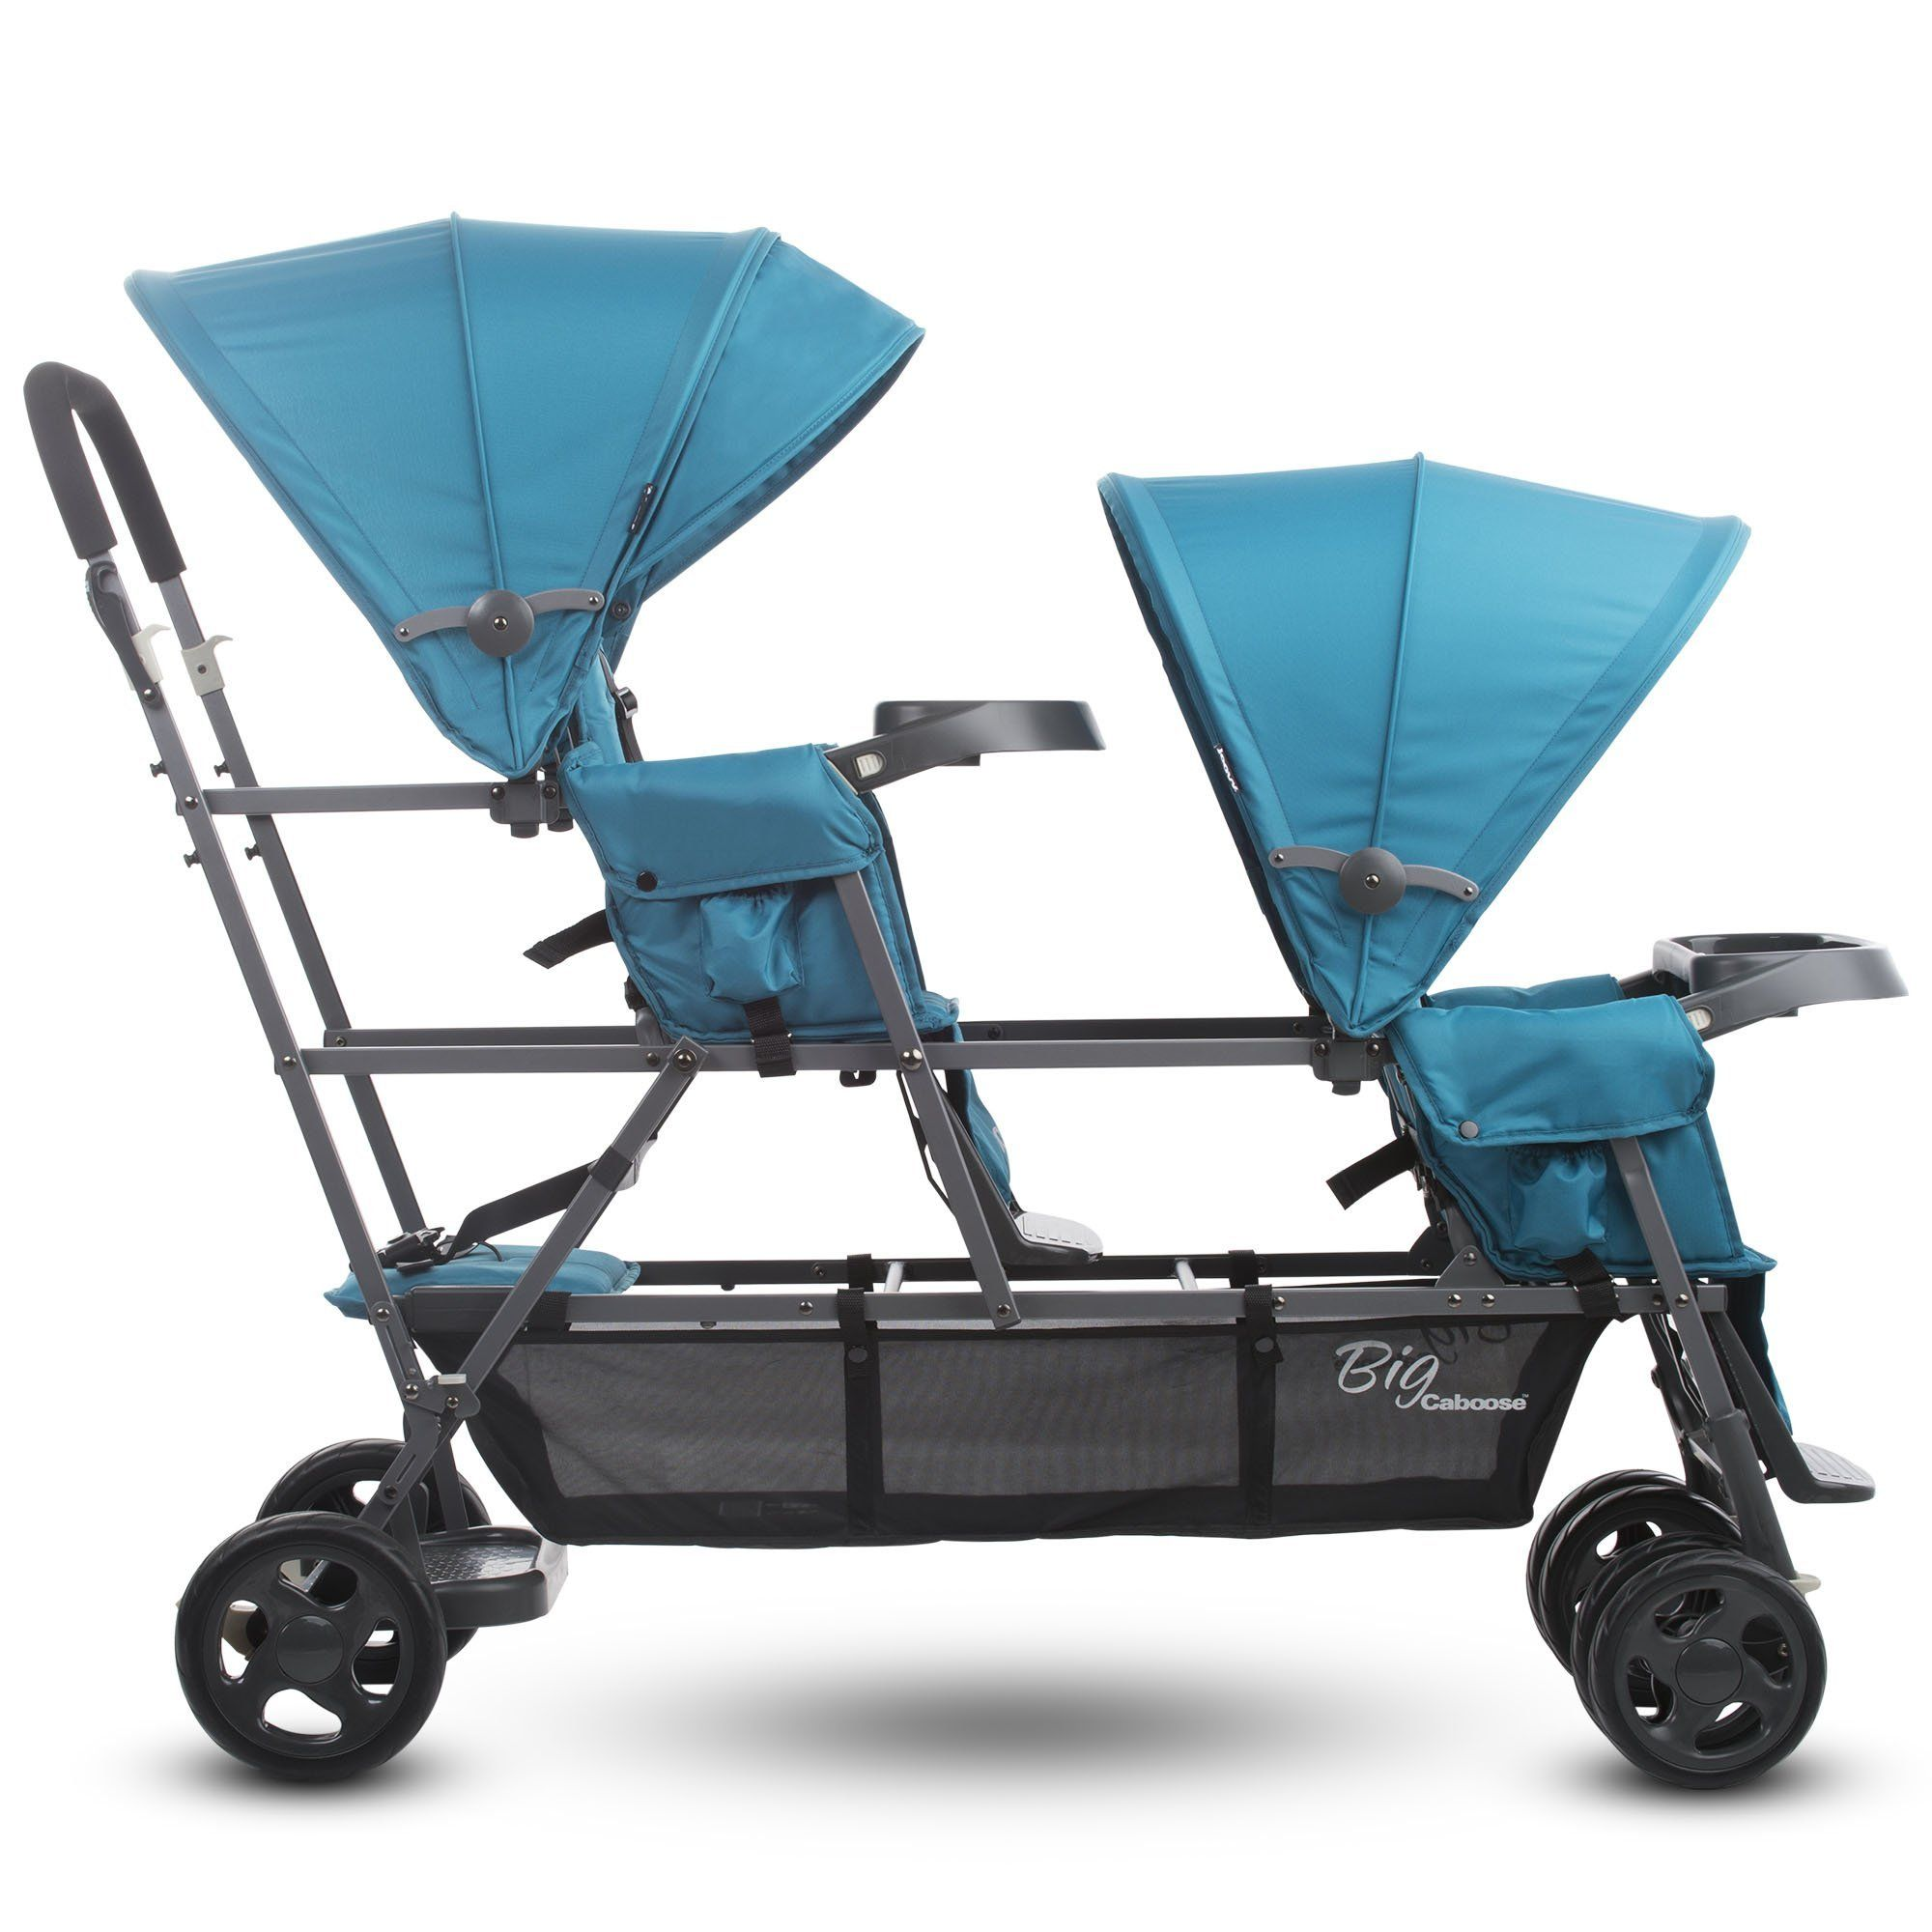 Joovy Big Caboose Graphite Stand On Triple Stroller, Turq